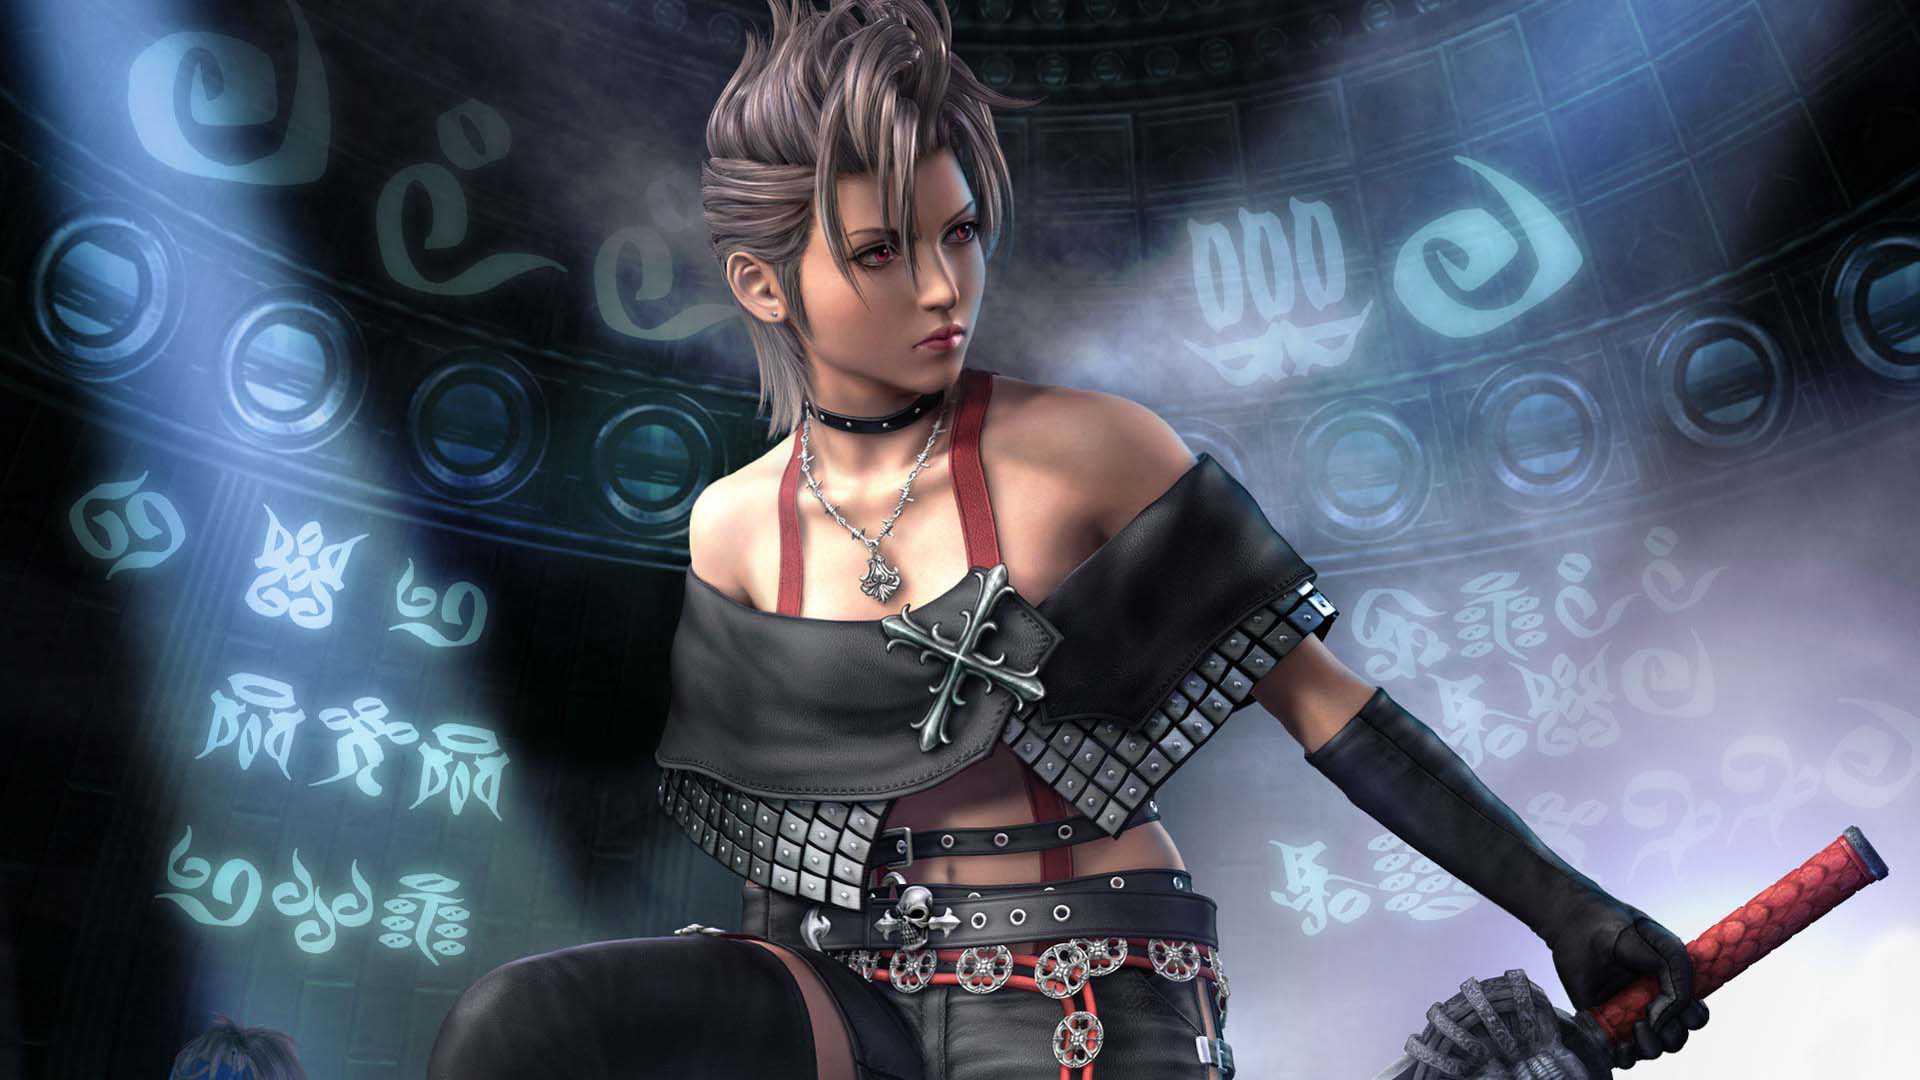 Final Fantasy X-2 HD screenshots look amazing